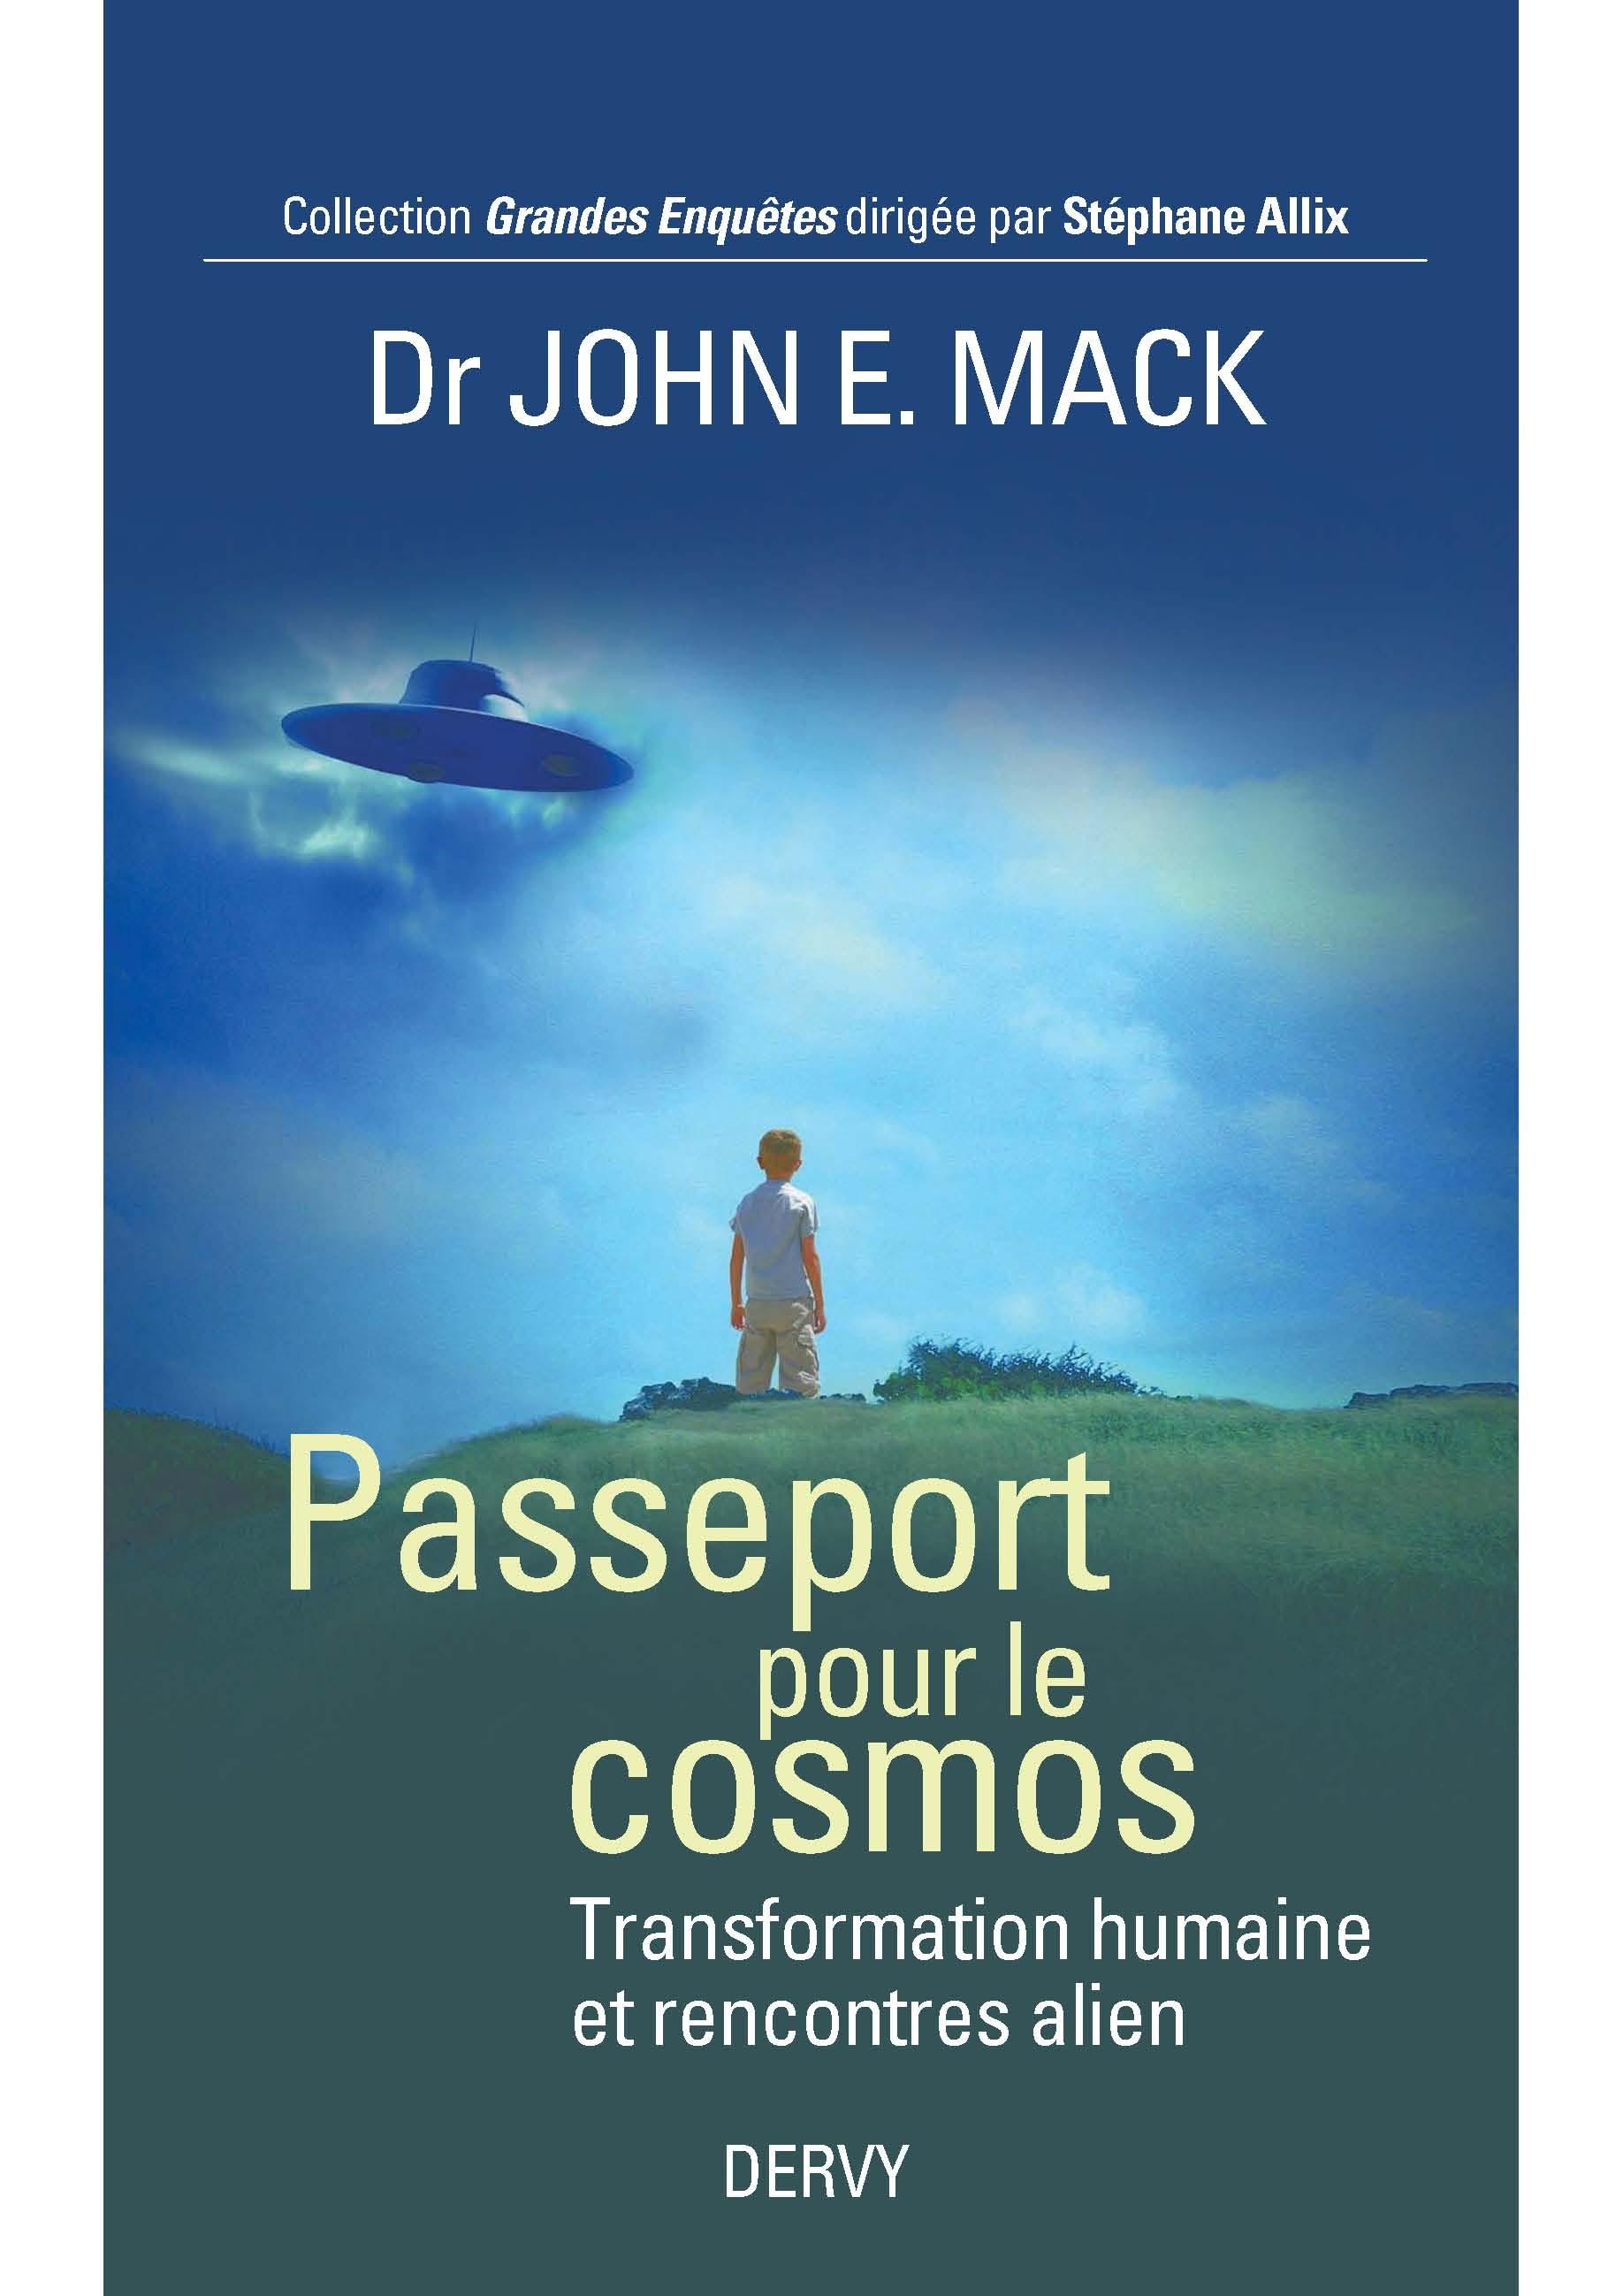 Passeport pour le Cosmos.jpg